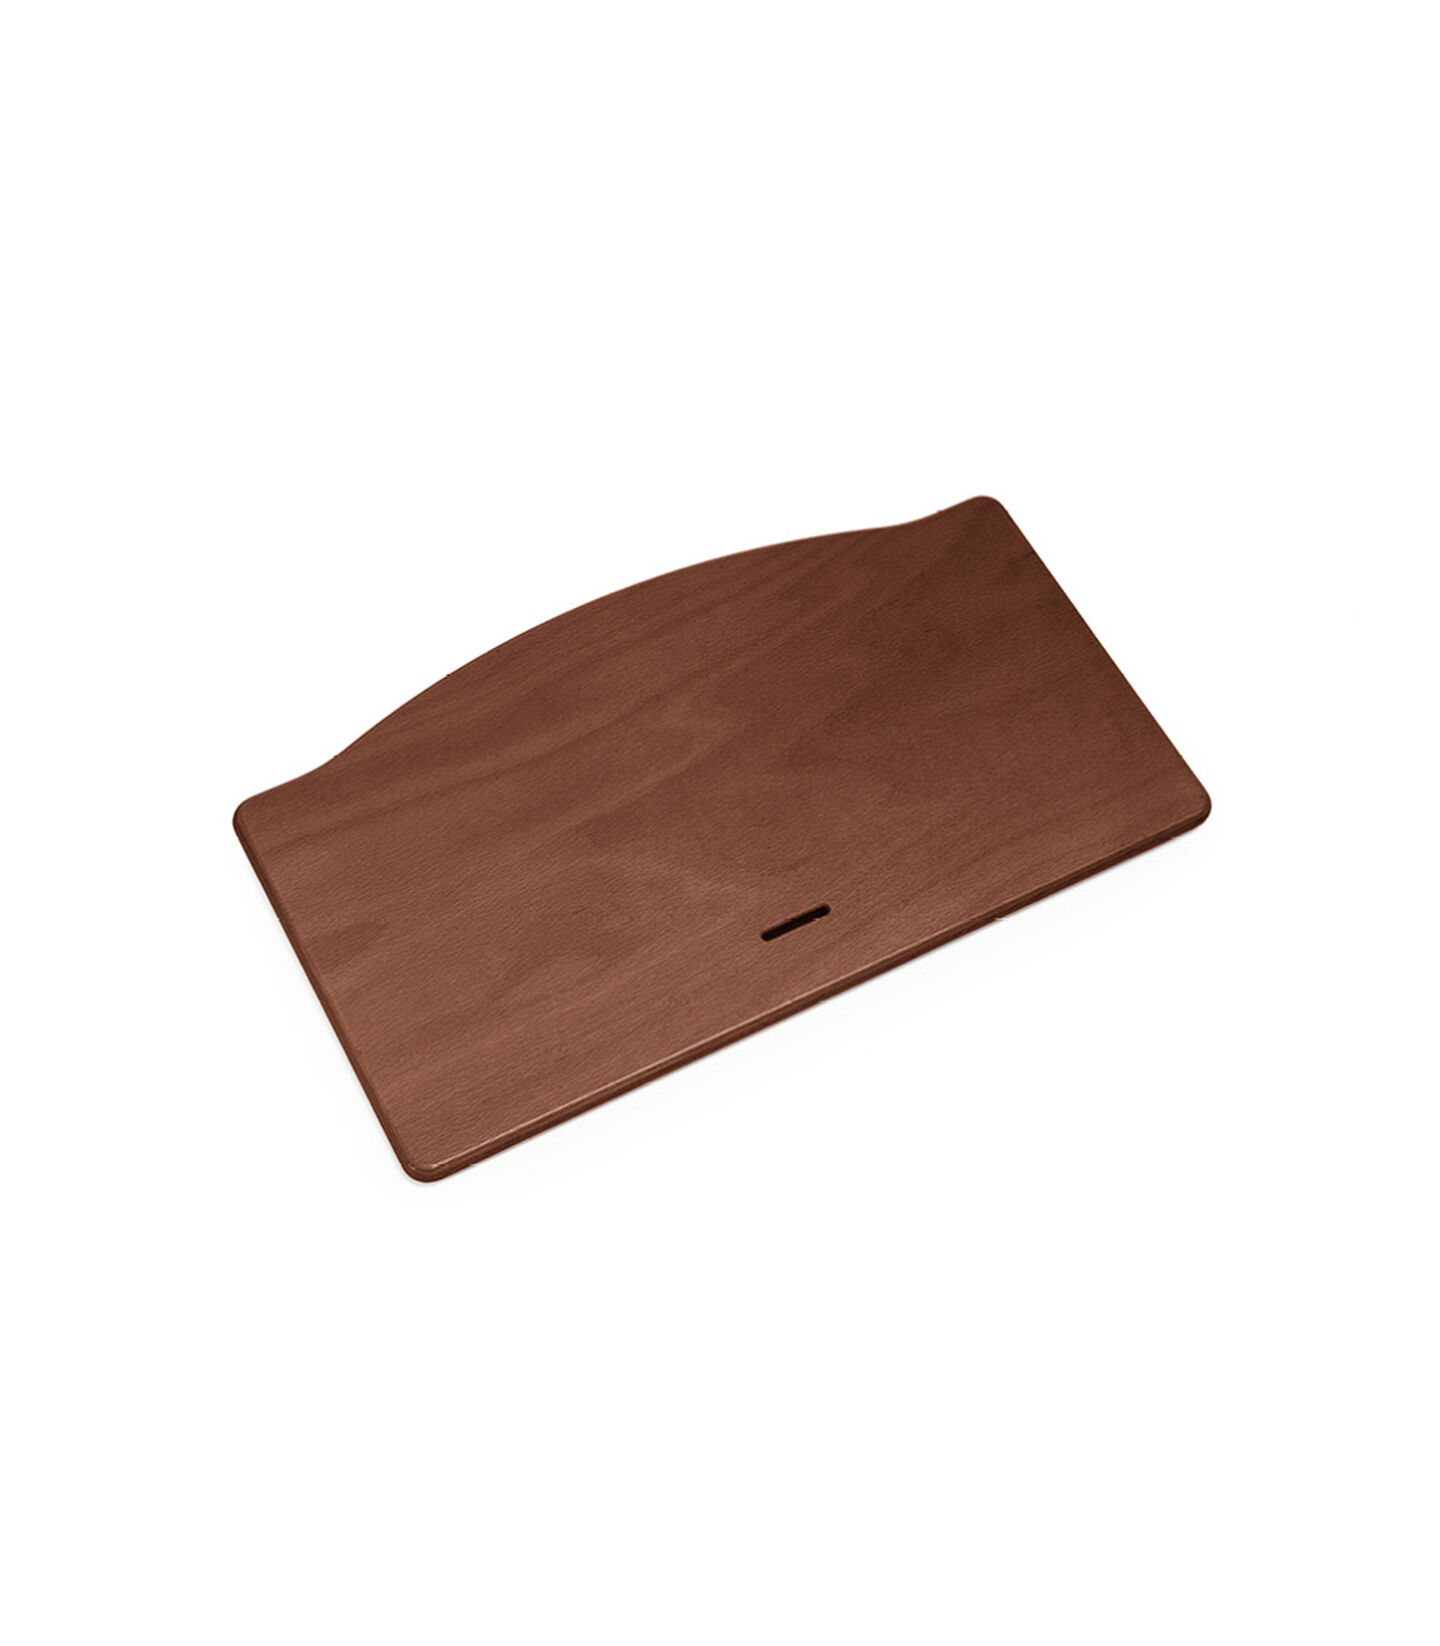 Tripp Trapp® Sitteplate Walnut Brown, Walnut, mainview view 1